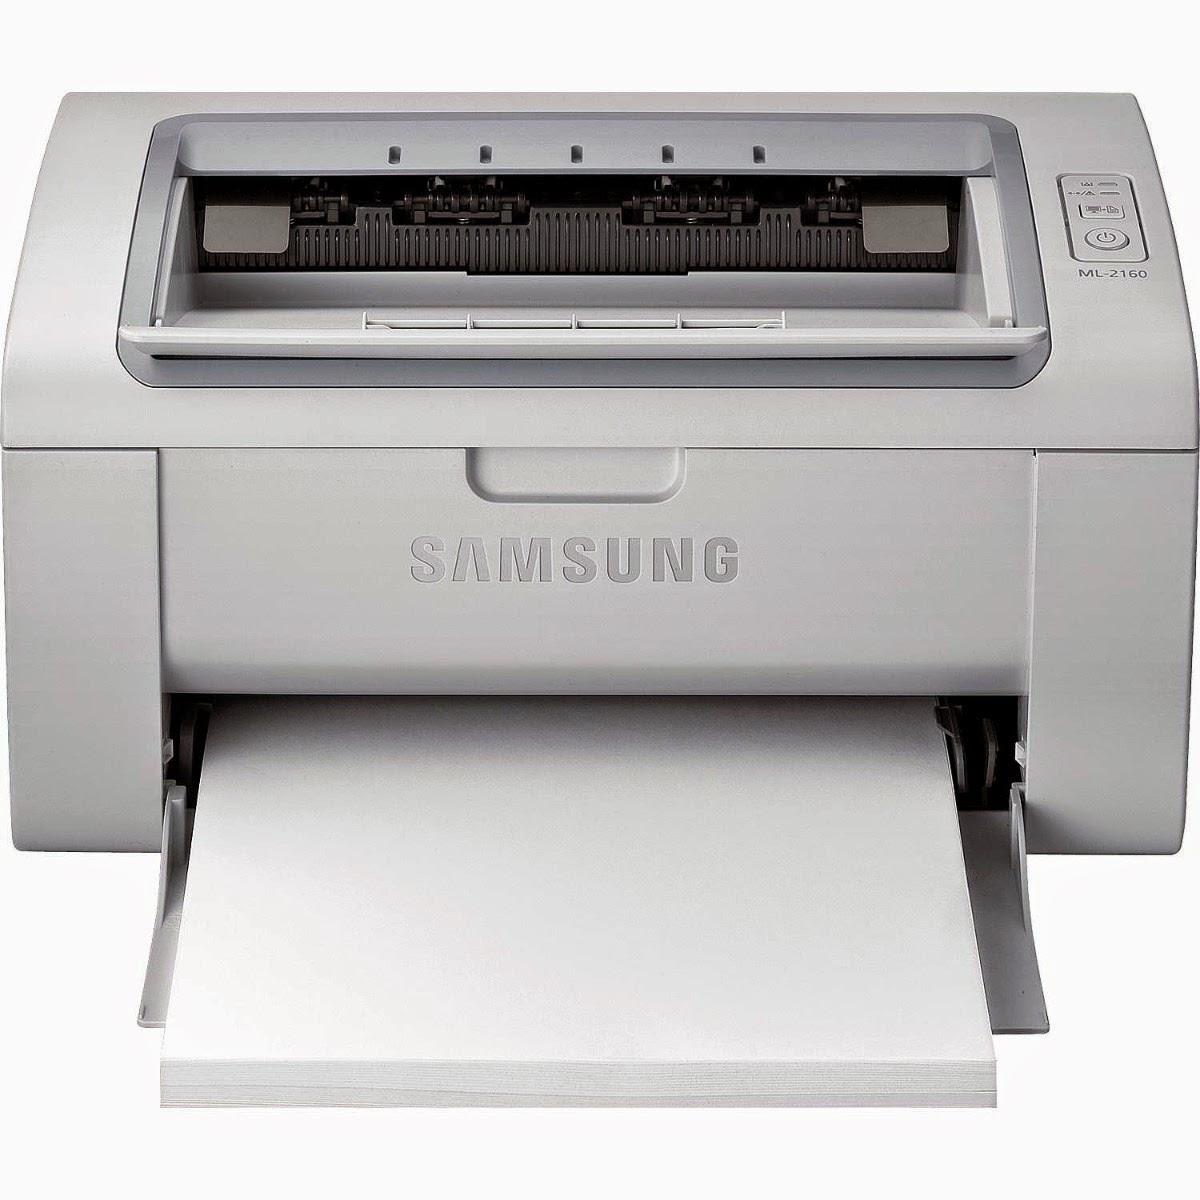 Ml 2165 Samsung Printer Driver